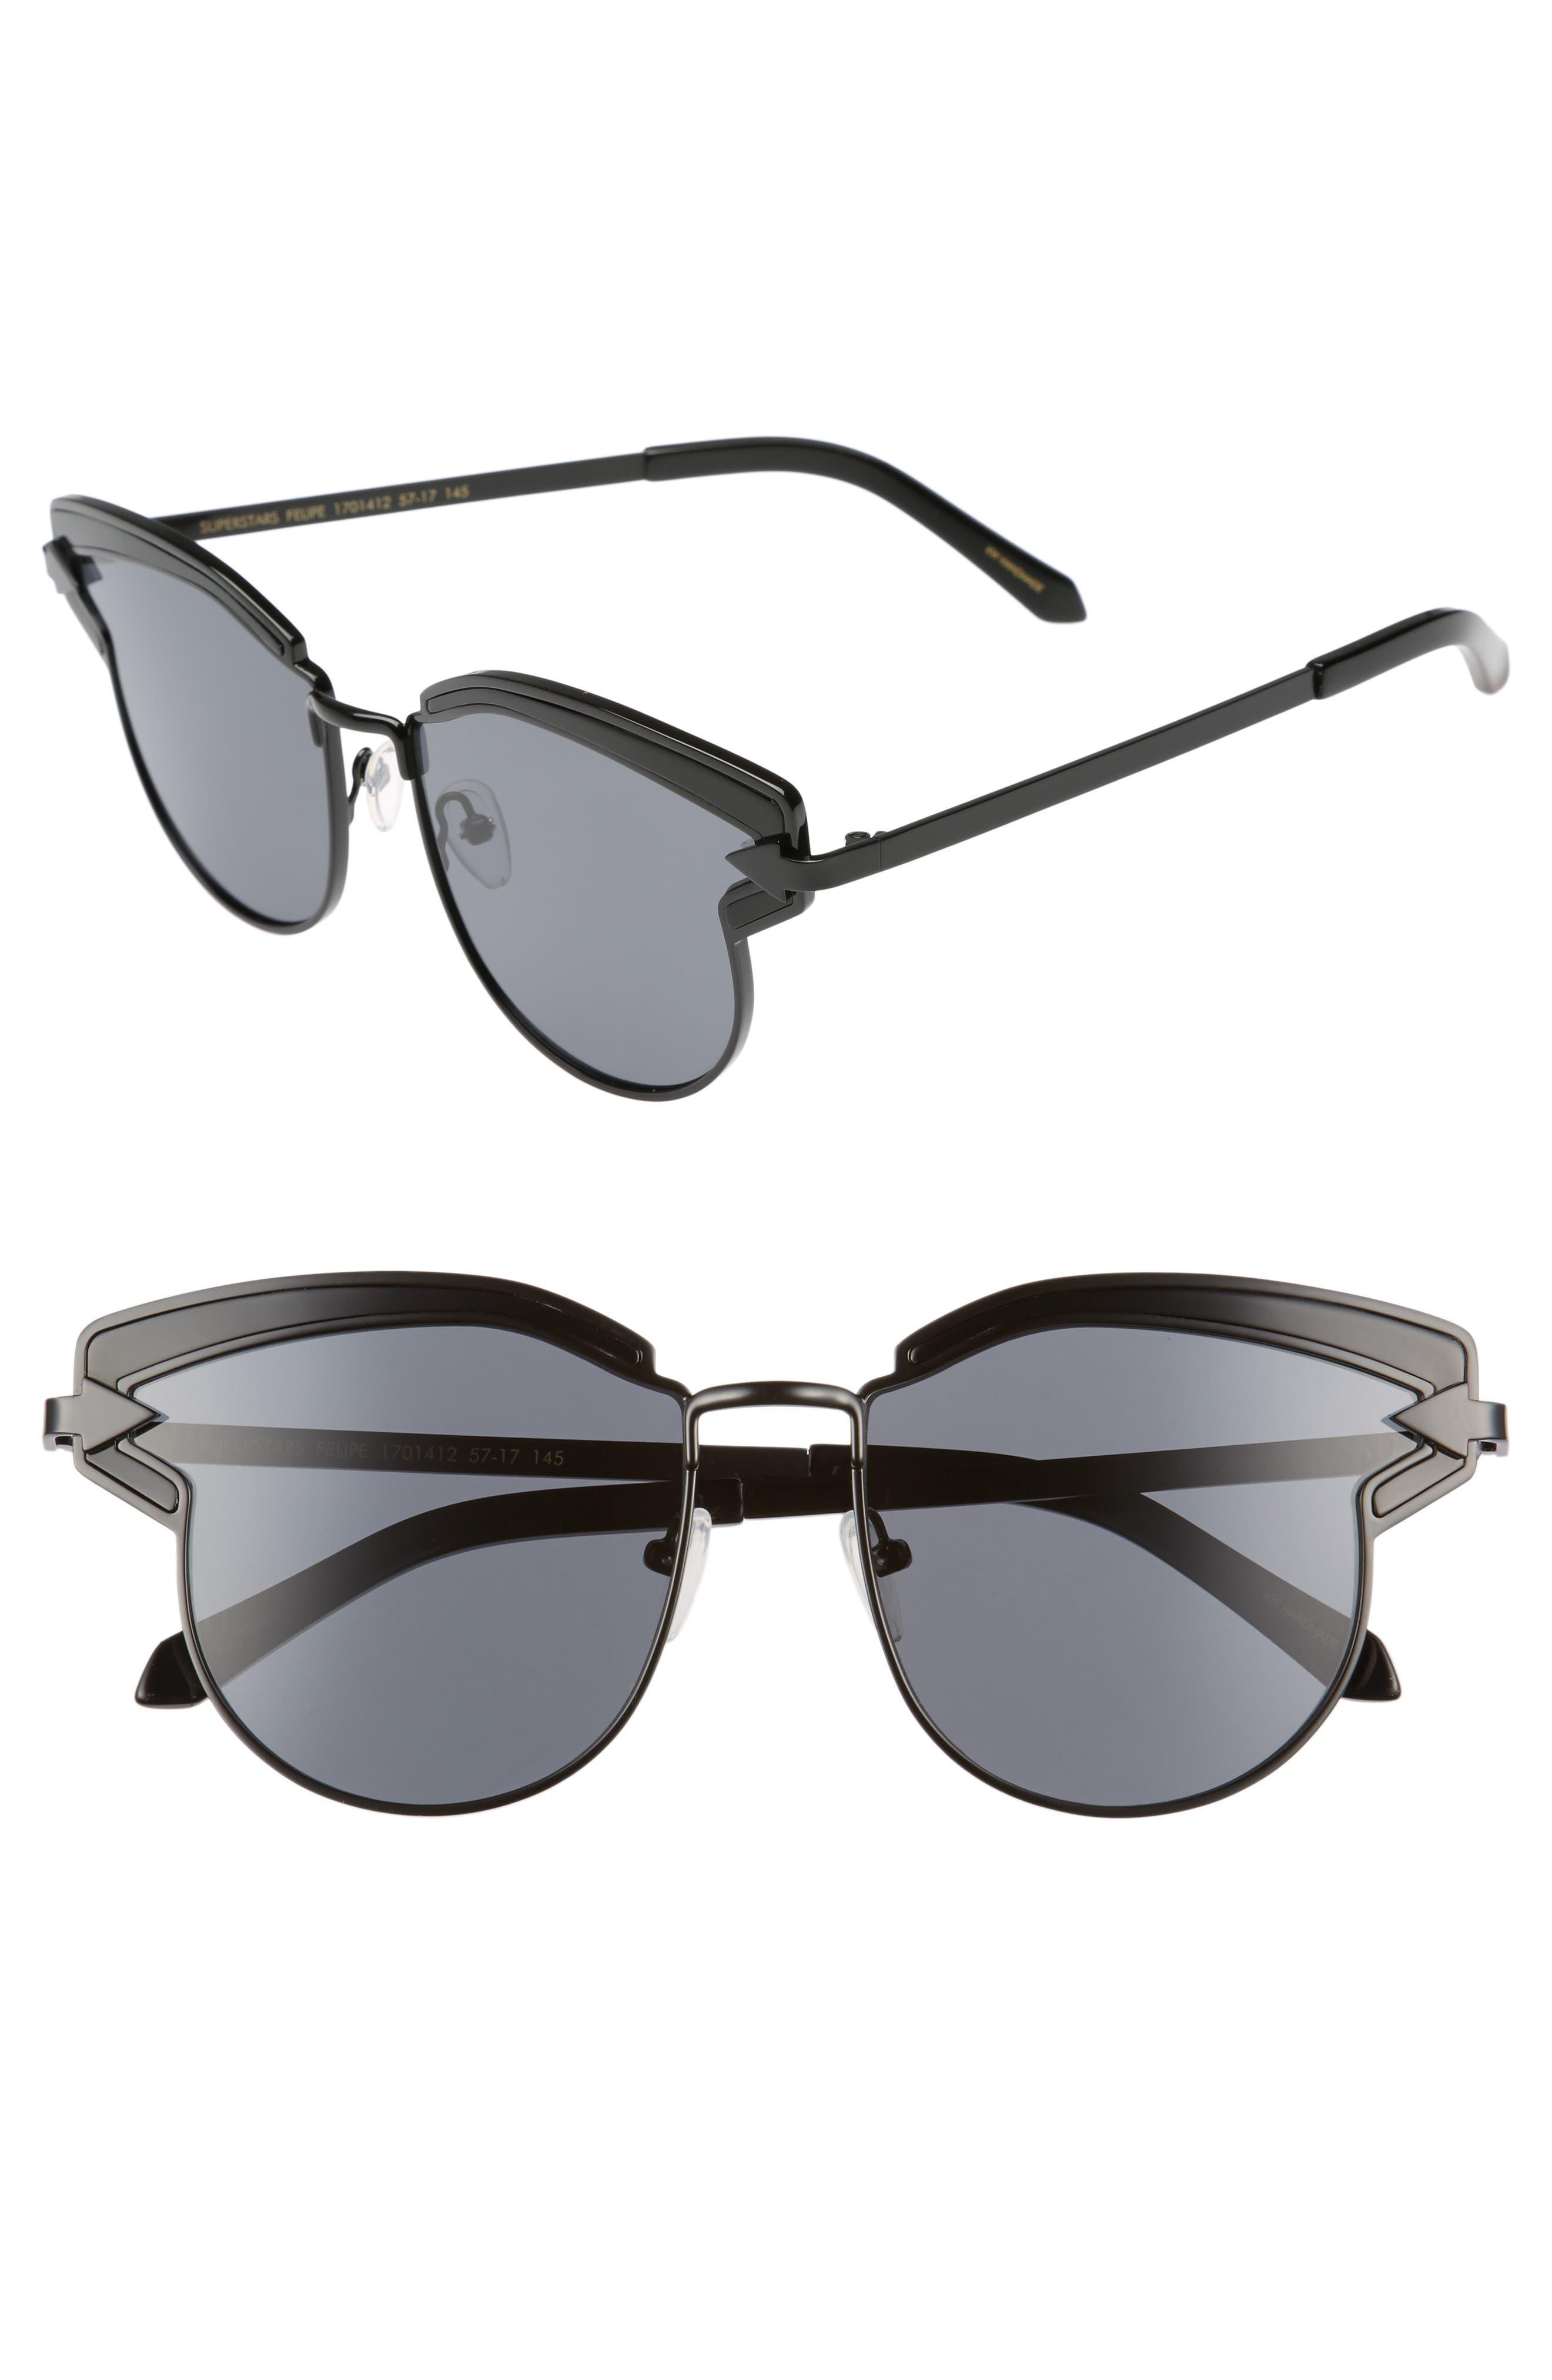 Buccaneer 47mm Round Sunglasses,                             Main thumbnail 1, color,